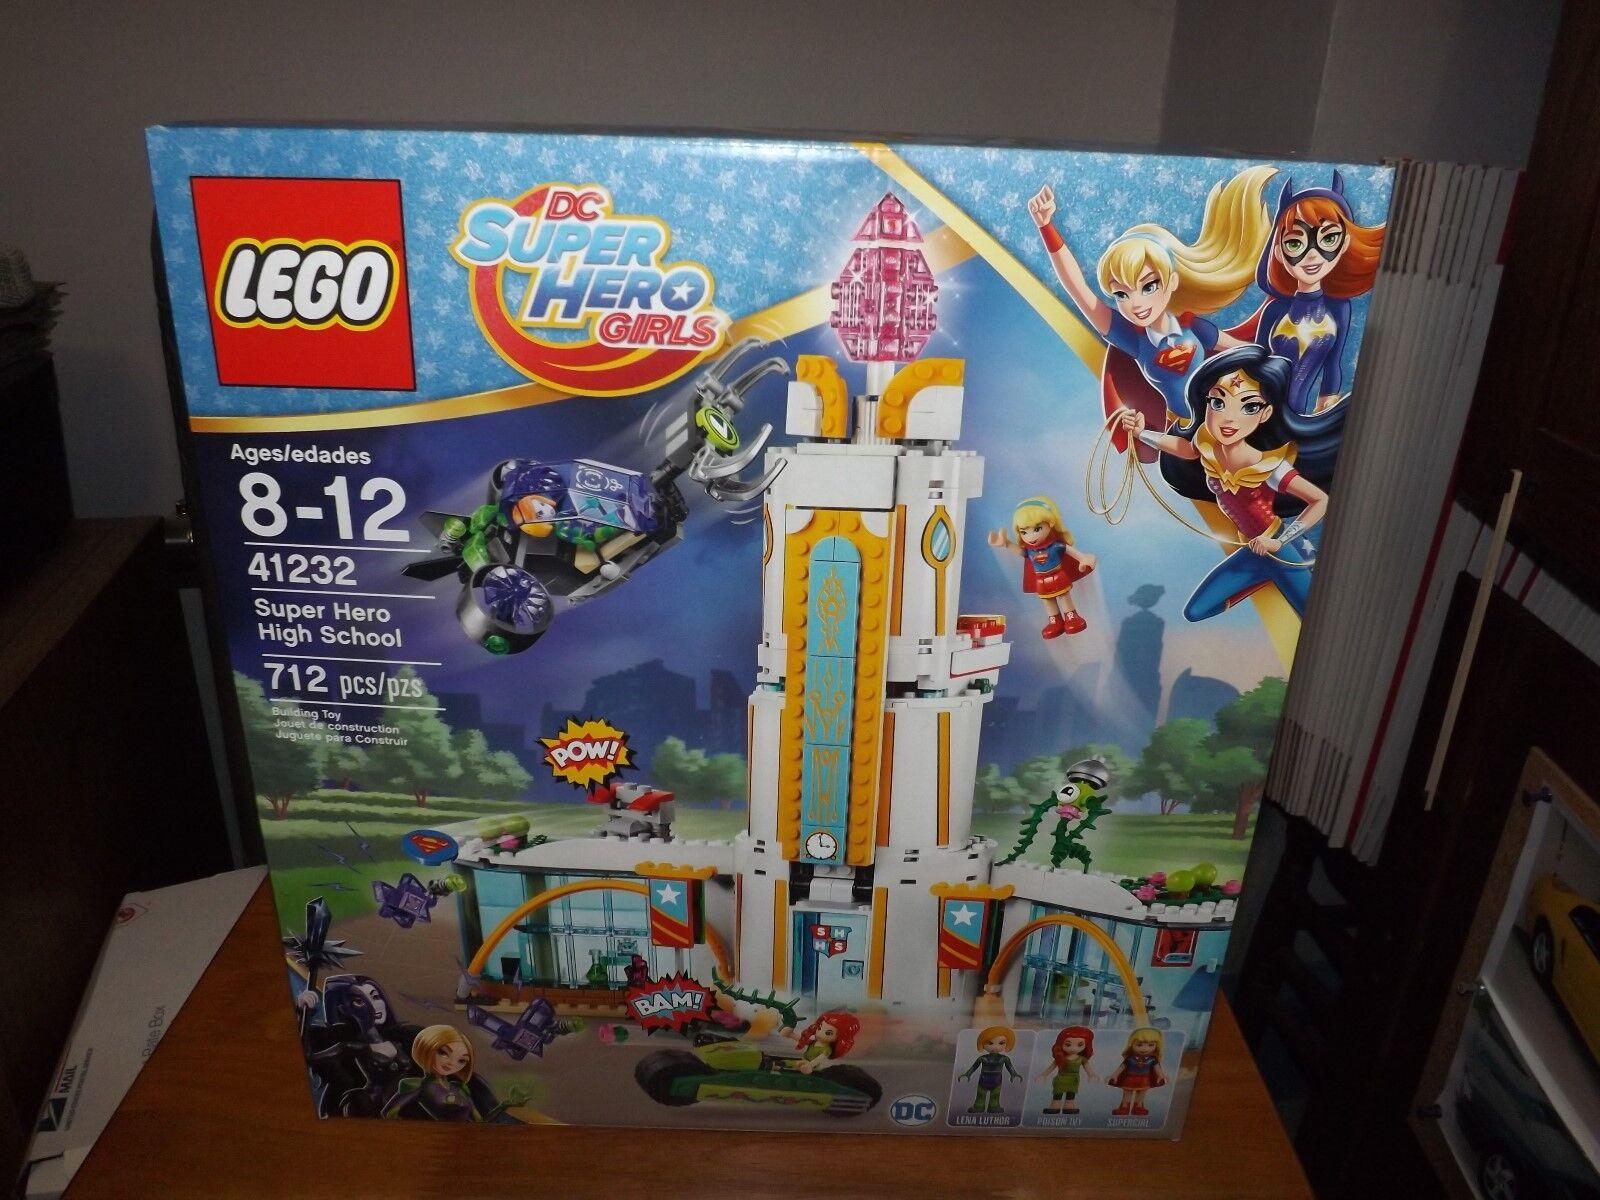 LEGO, DC SUPER HERO GIRLS, SUPER HERO HIGH SCHOOL, KIT  41232, 712 PCS, NIB 2016